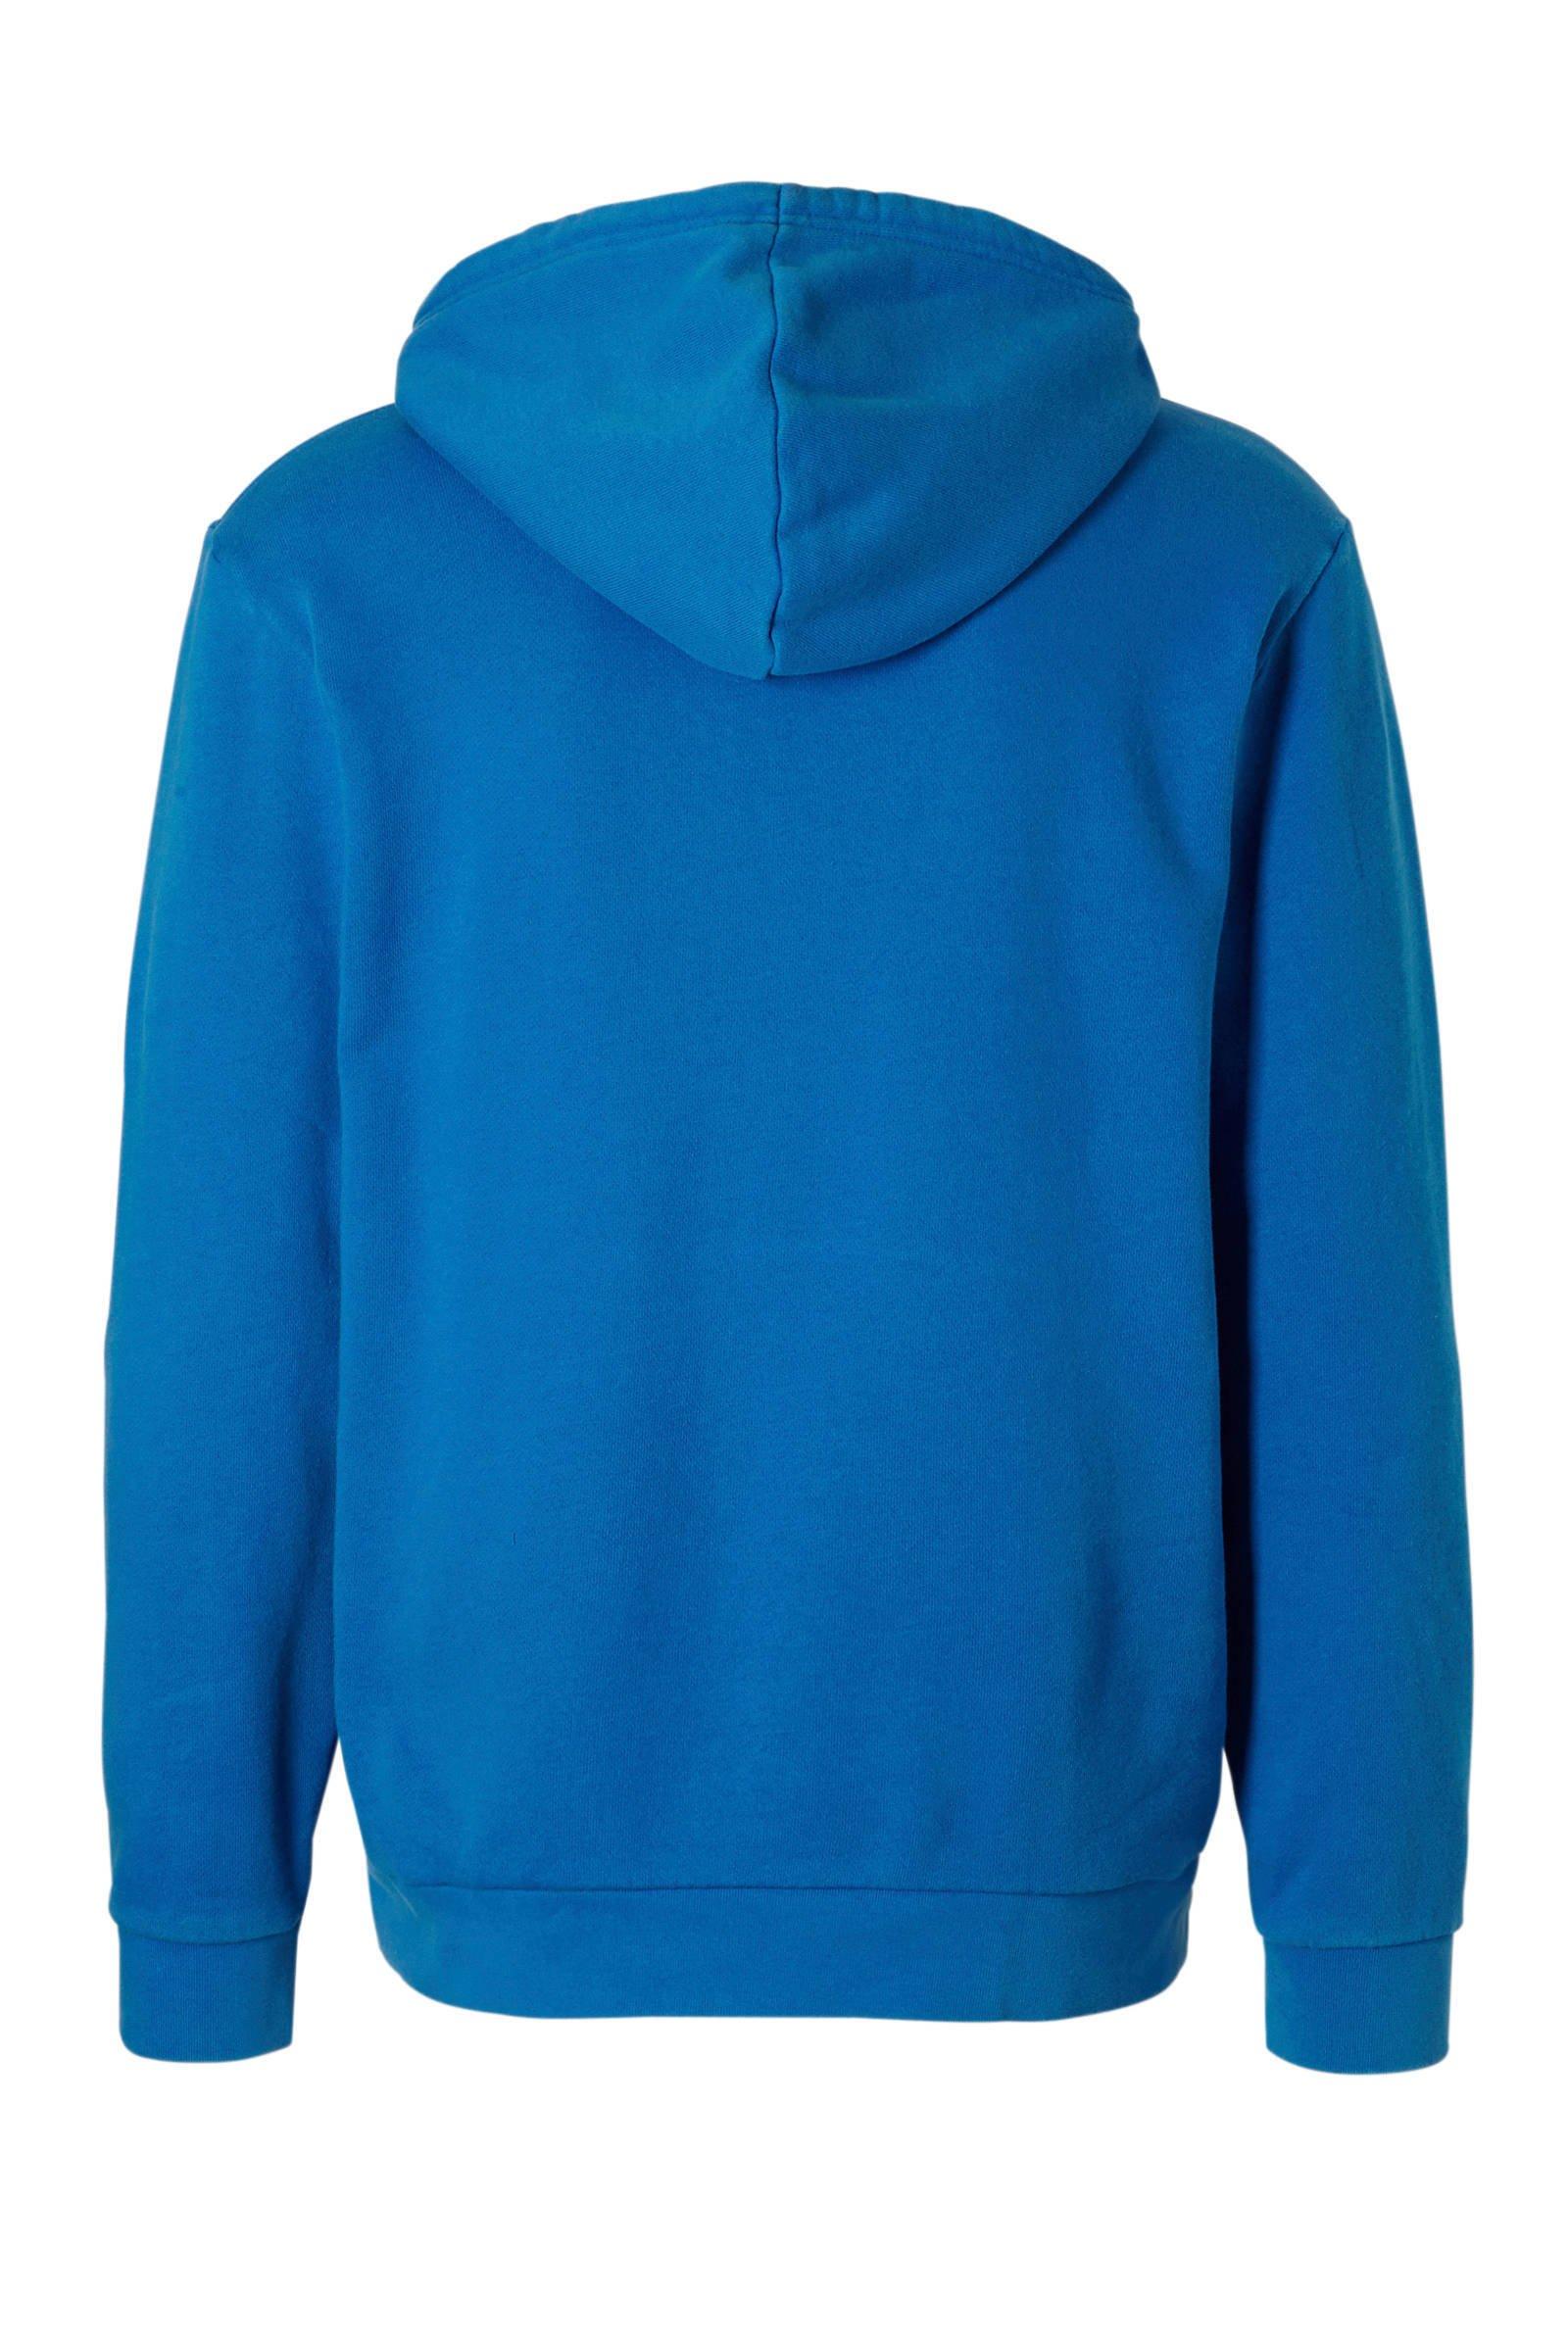 adidas originals hoodie heren 8f25a9